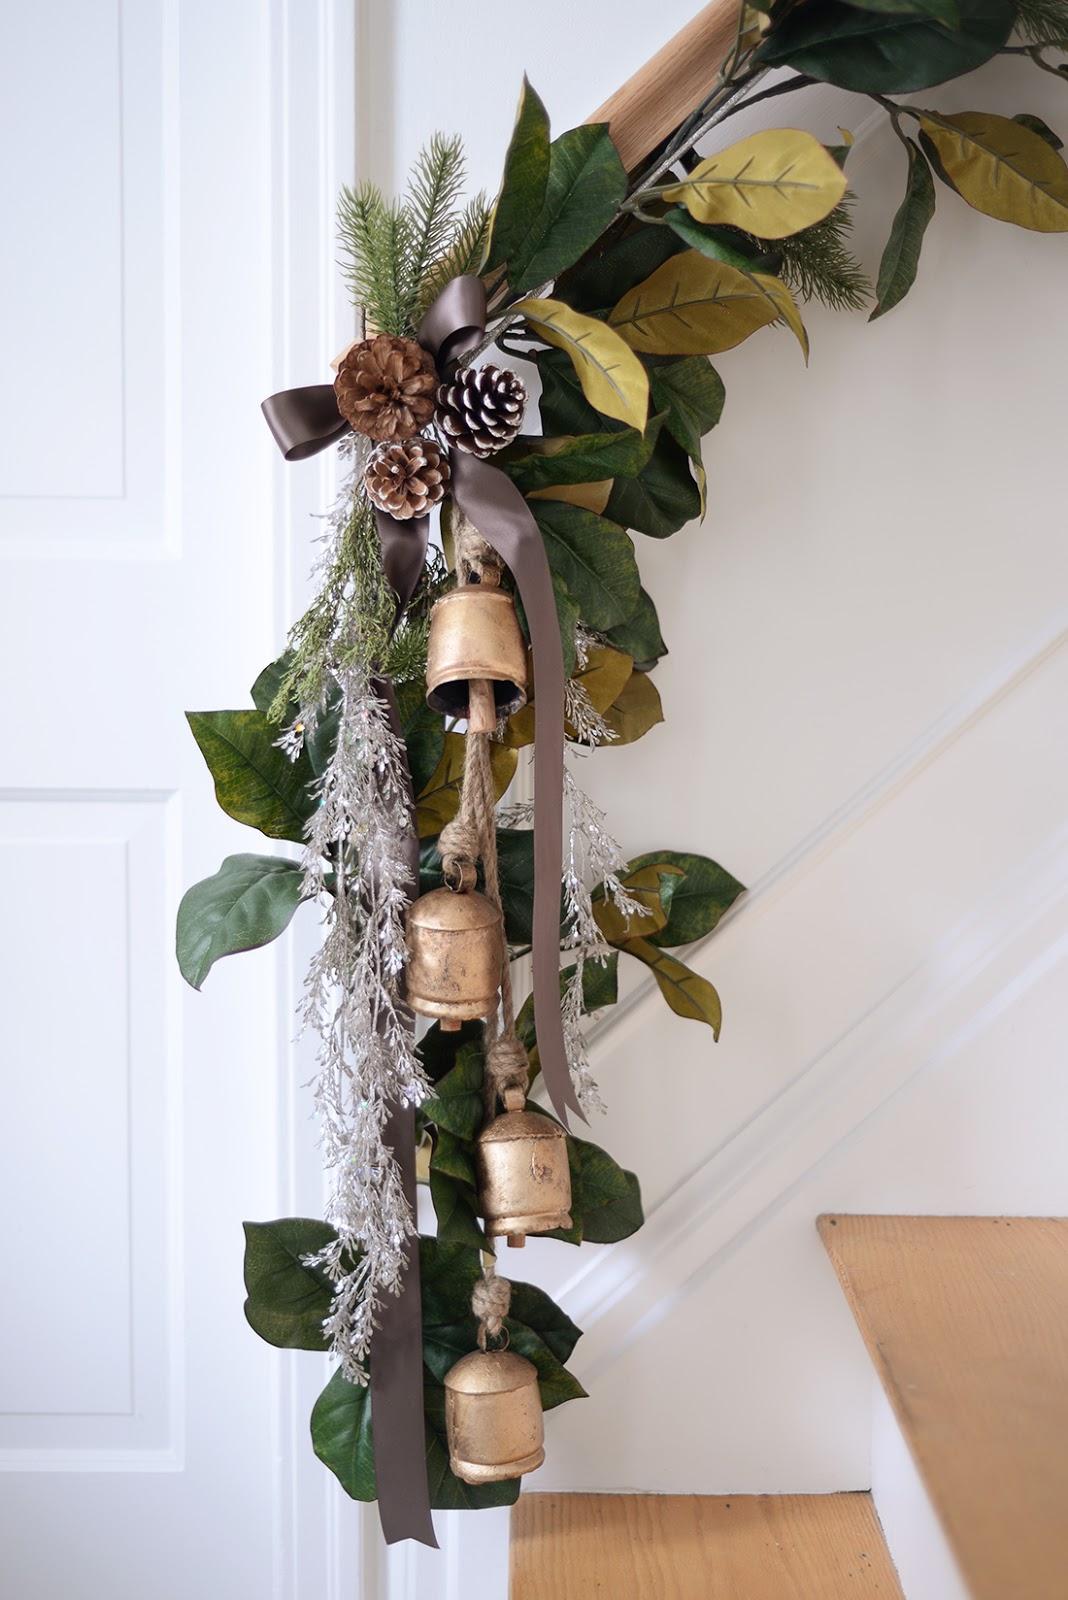 magnolia garland on stair handrail, brass bells, brown satin ribbon